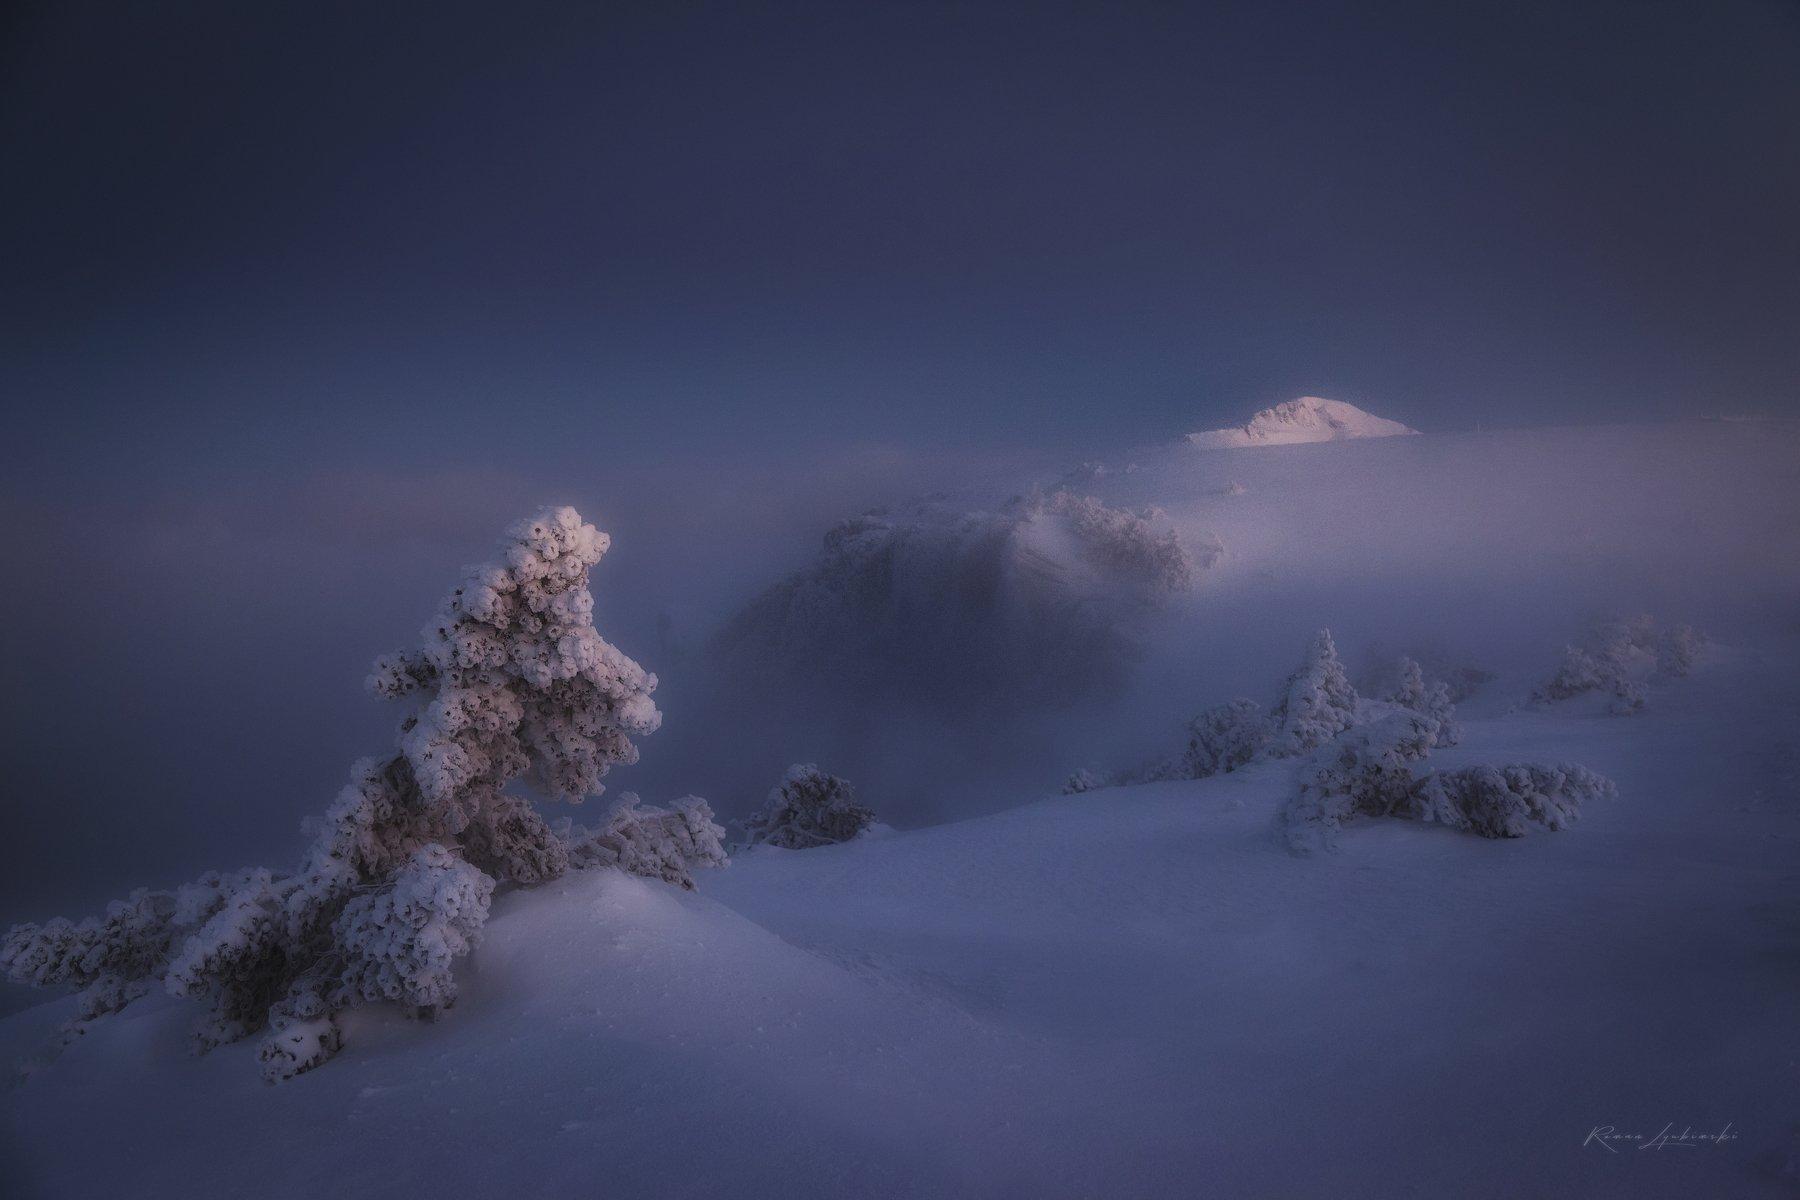 крым, горы, зима, снег, роман-кош, Роман Любимский